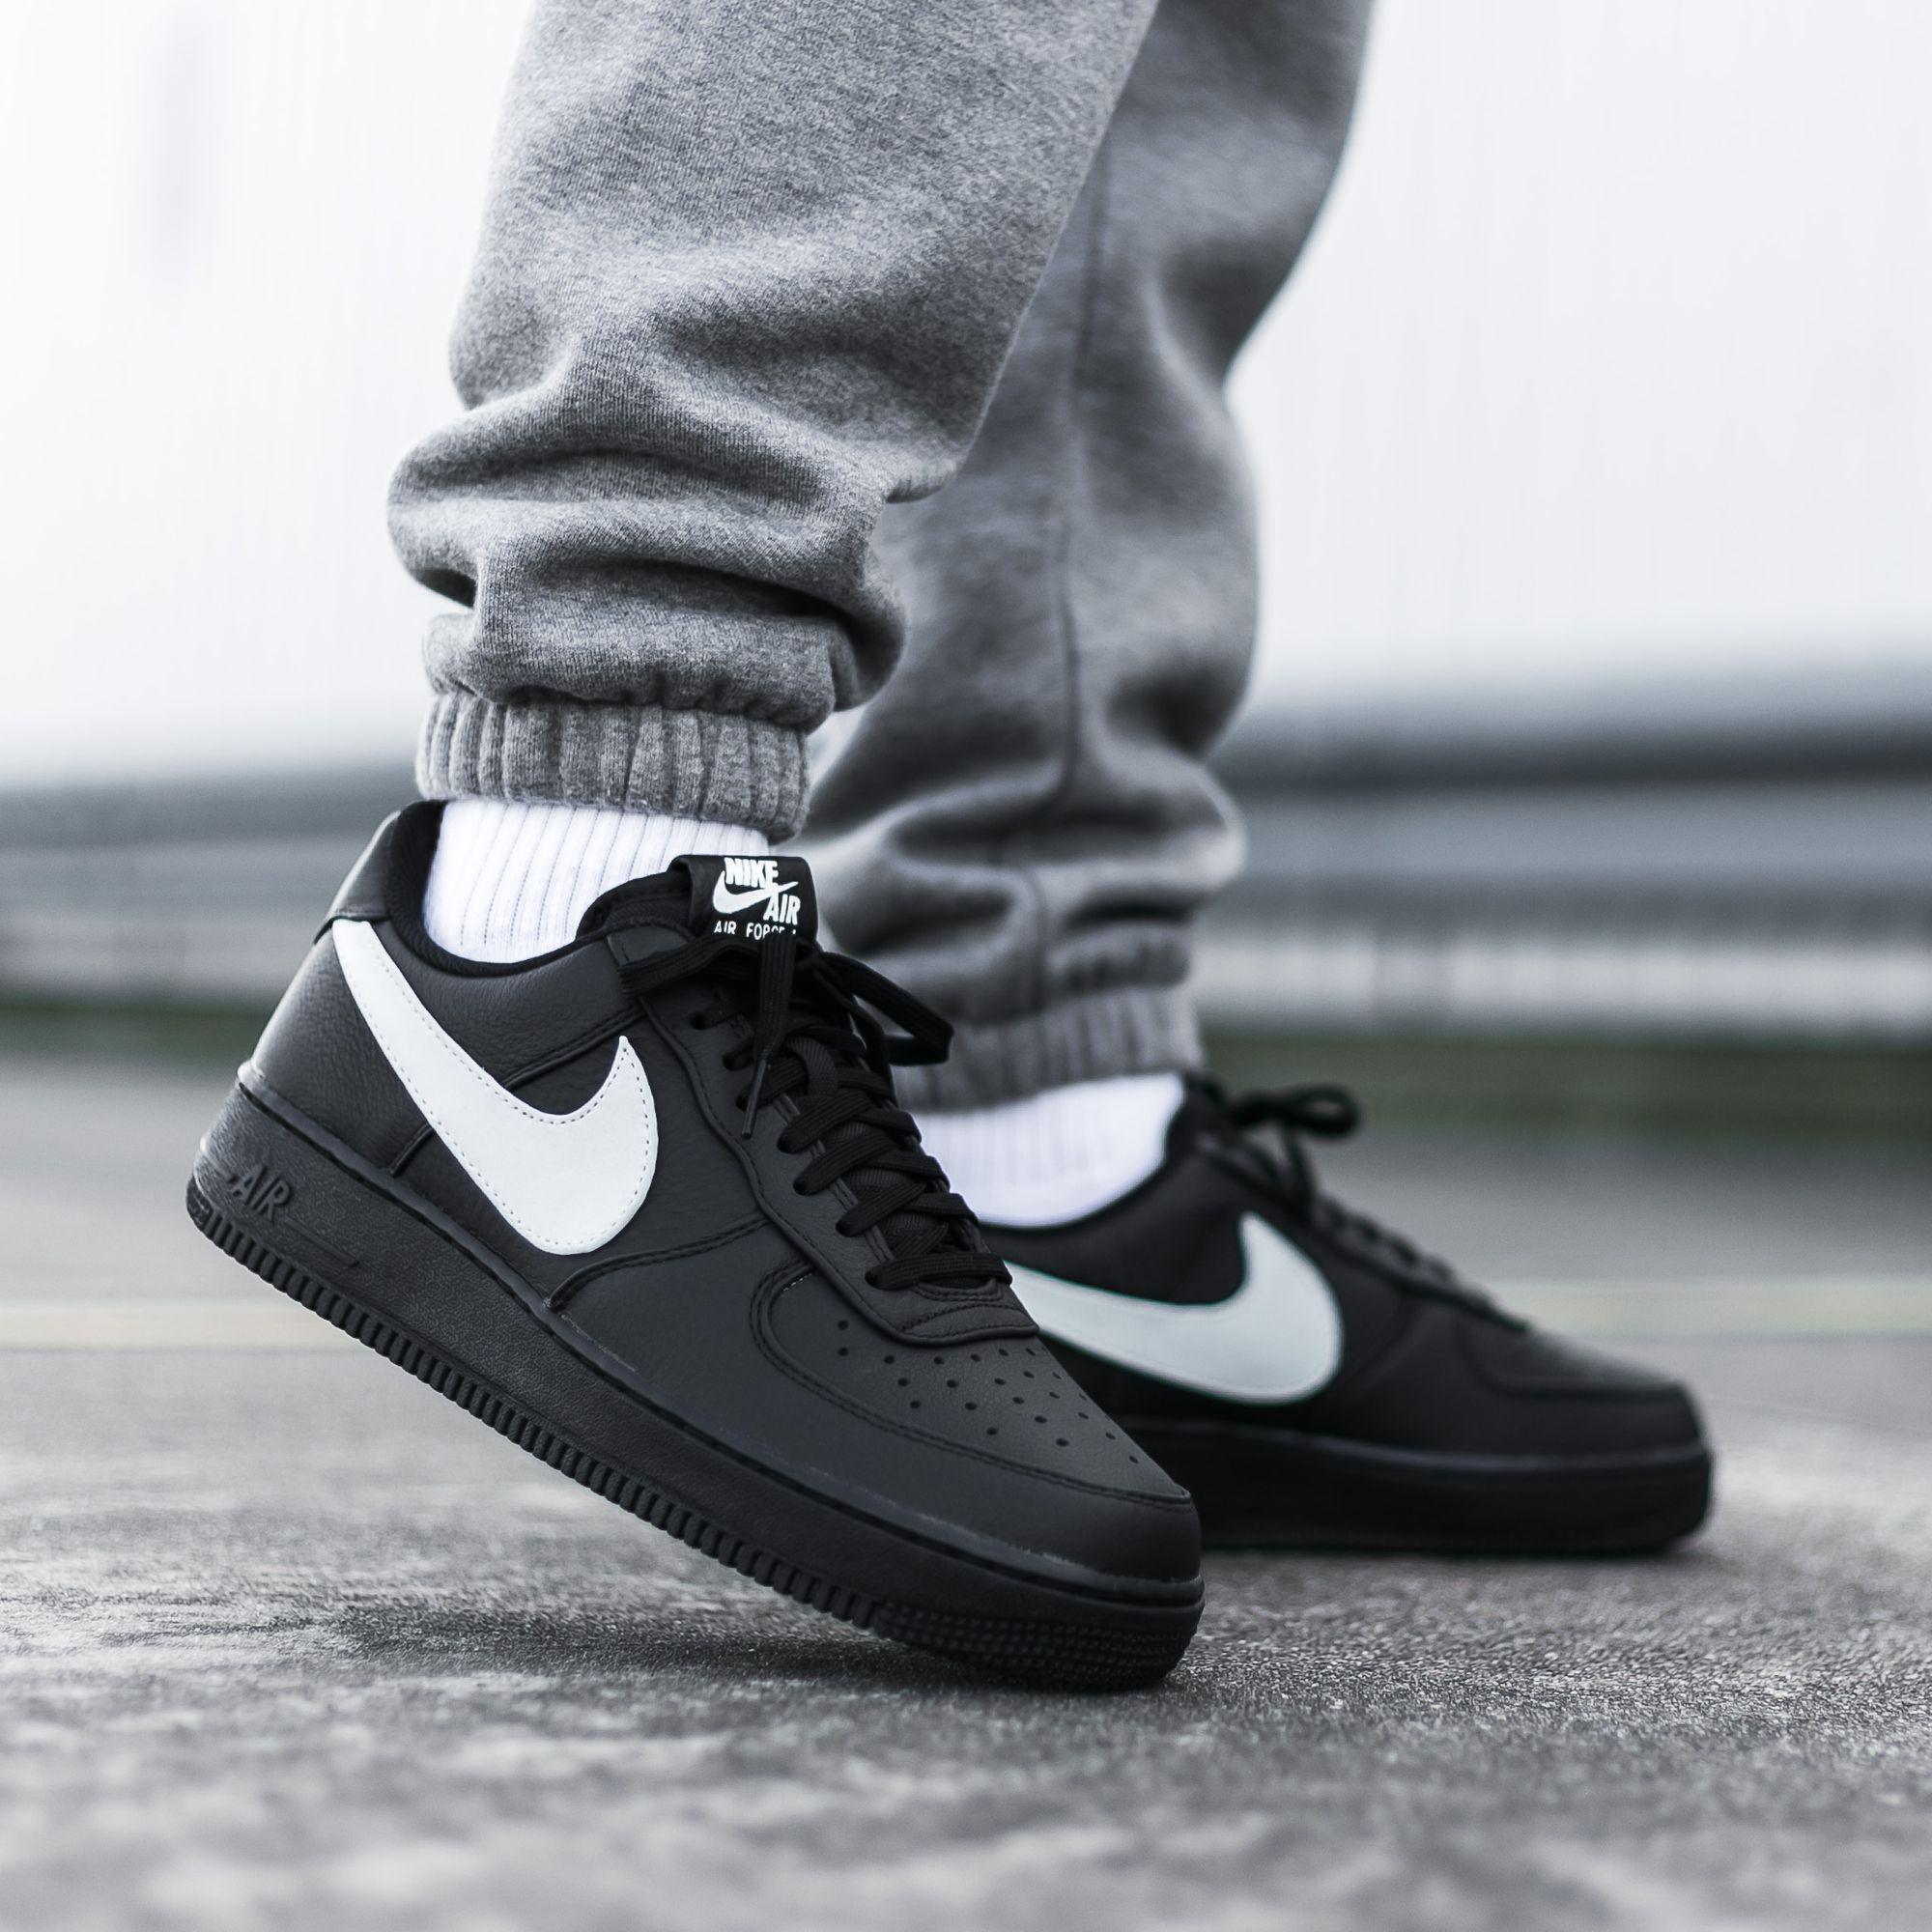 Big Swoosh Nike Air Force 1 07 Premium Black On Feet Nike Airforce1 Bigswoosh Nikelogo Sneakers Nikeairforce1 Poses Fotograficas Moda Estilo